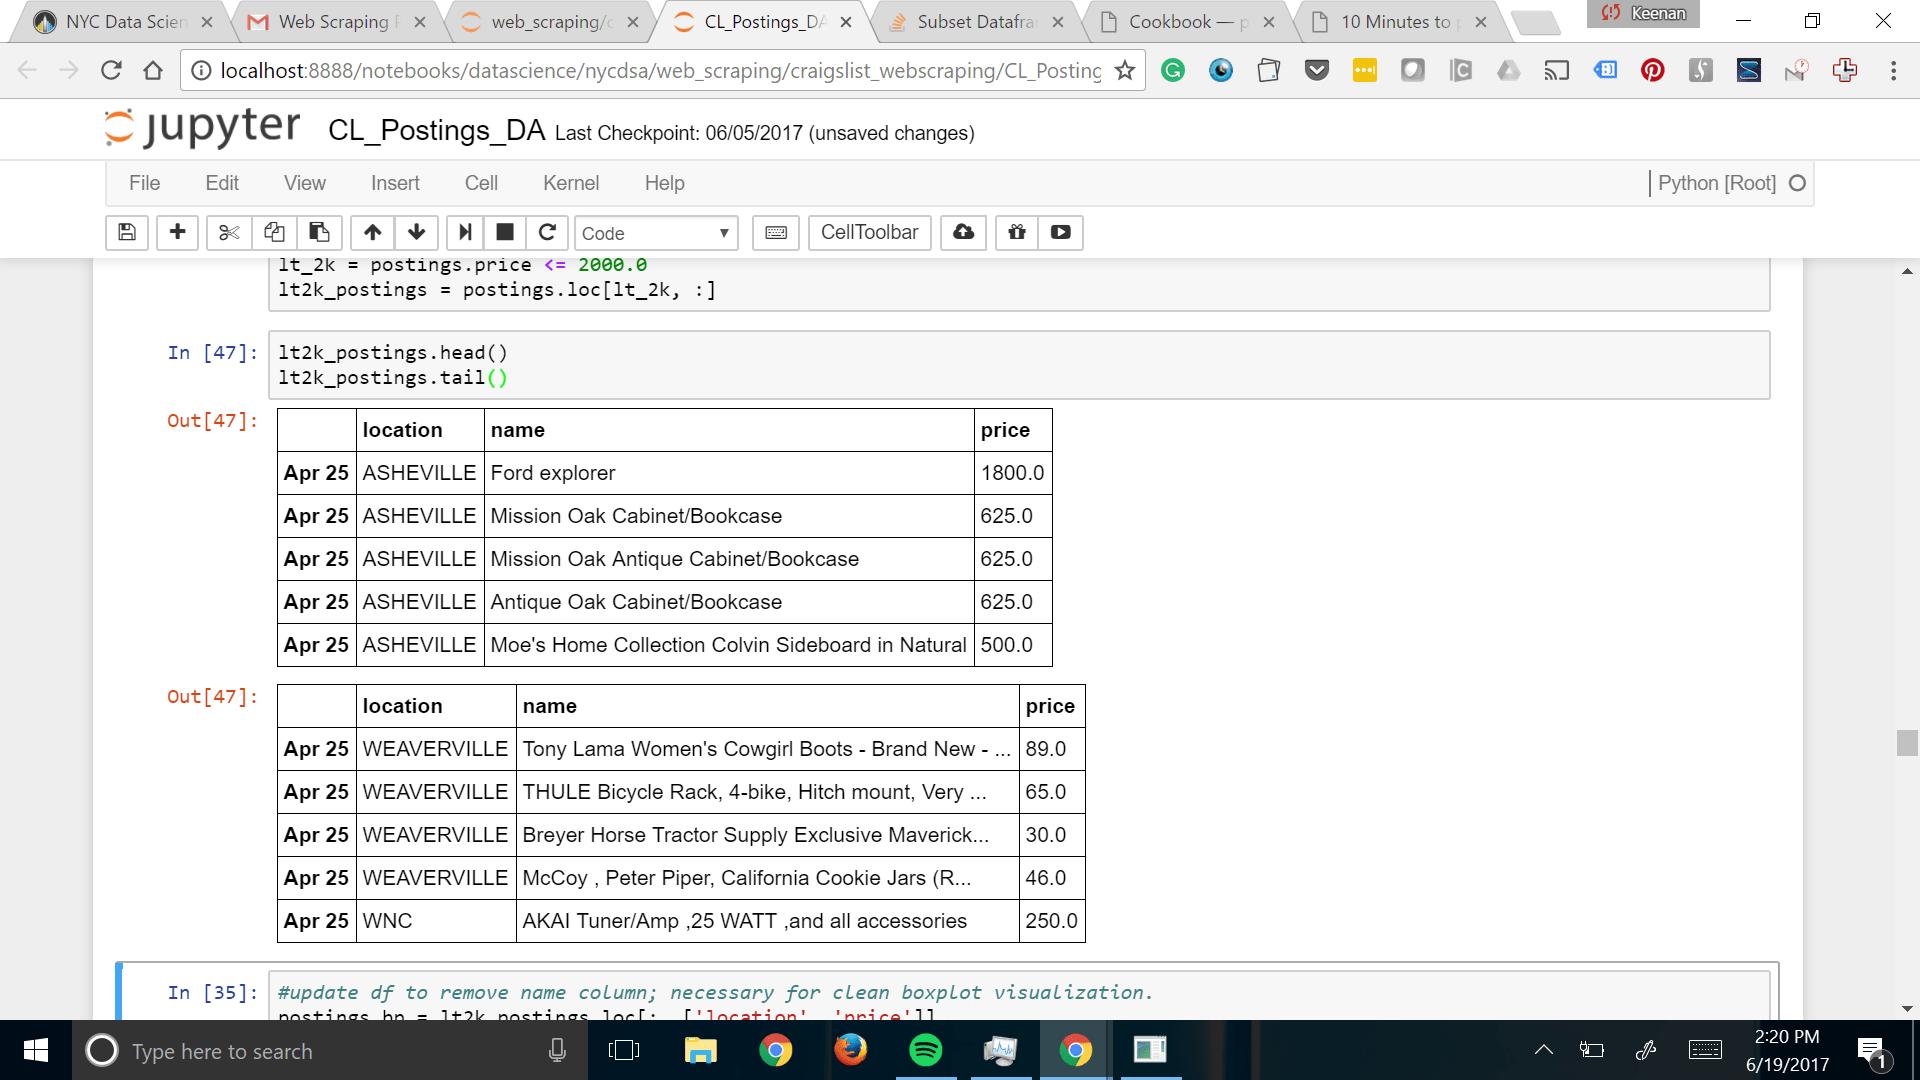 Subset Dataframe by Filtered Column (Python) - Codedump.io